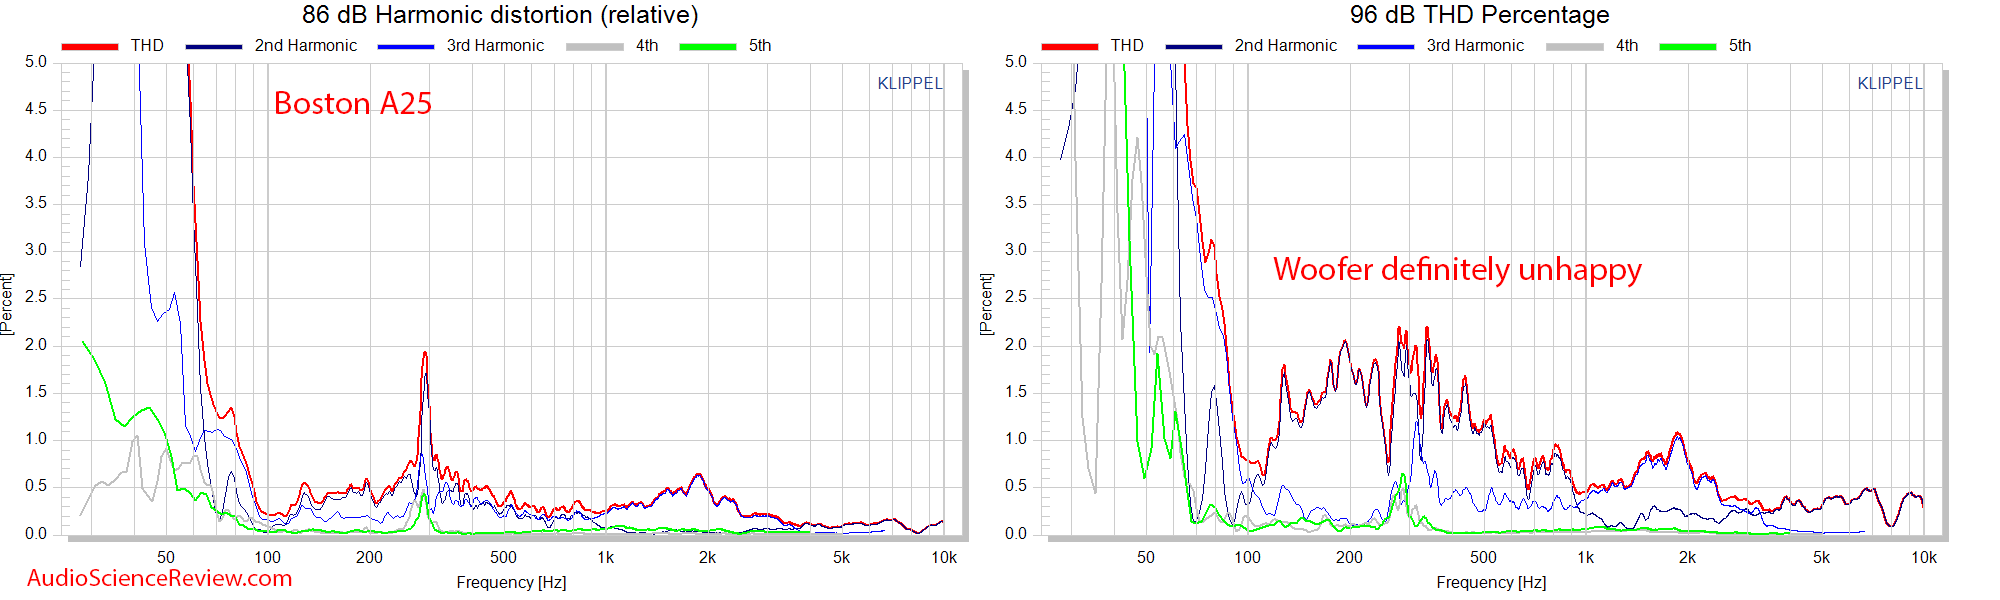 Boston Acoustics A 25 measurement relative thd distortion.png